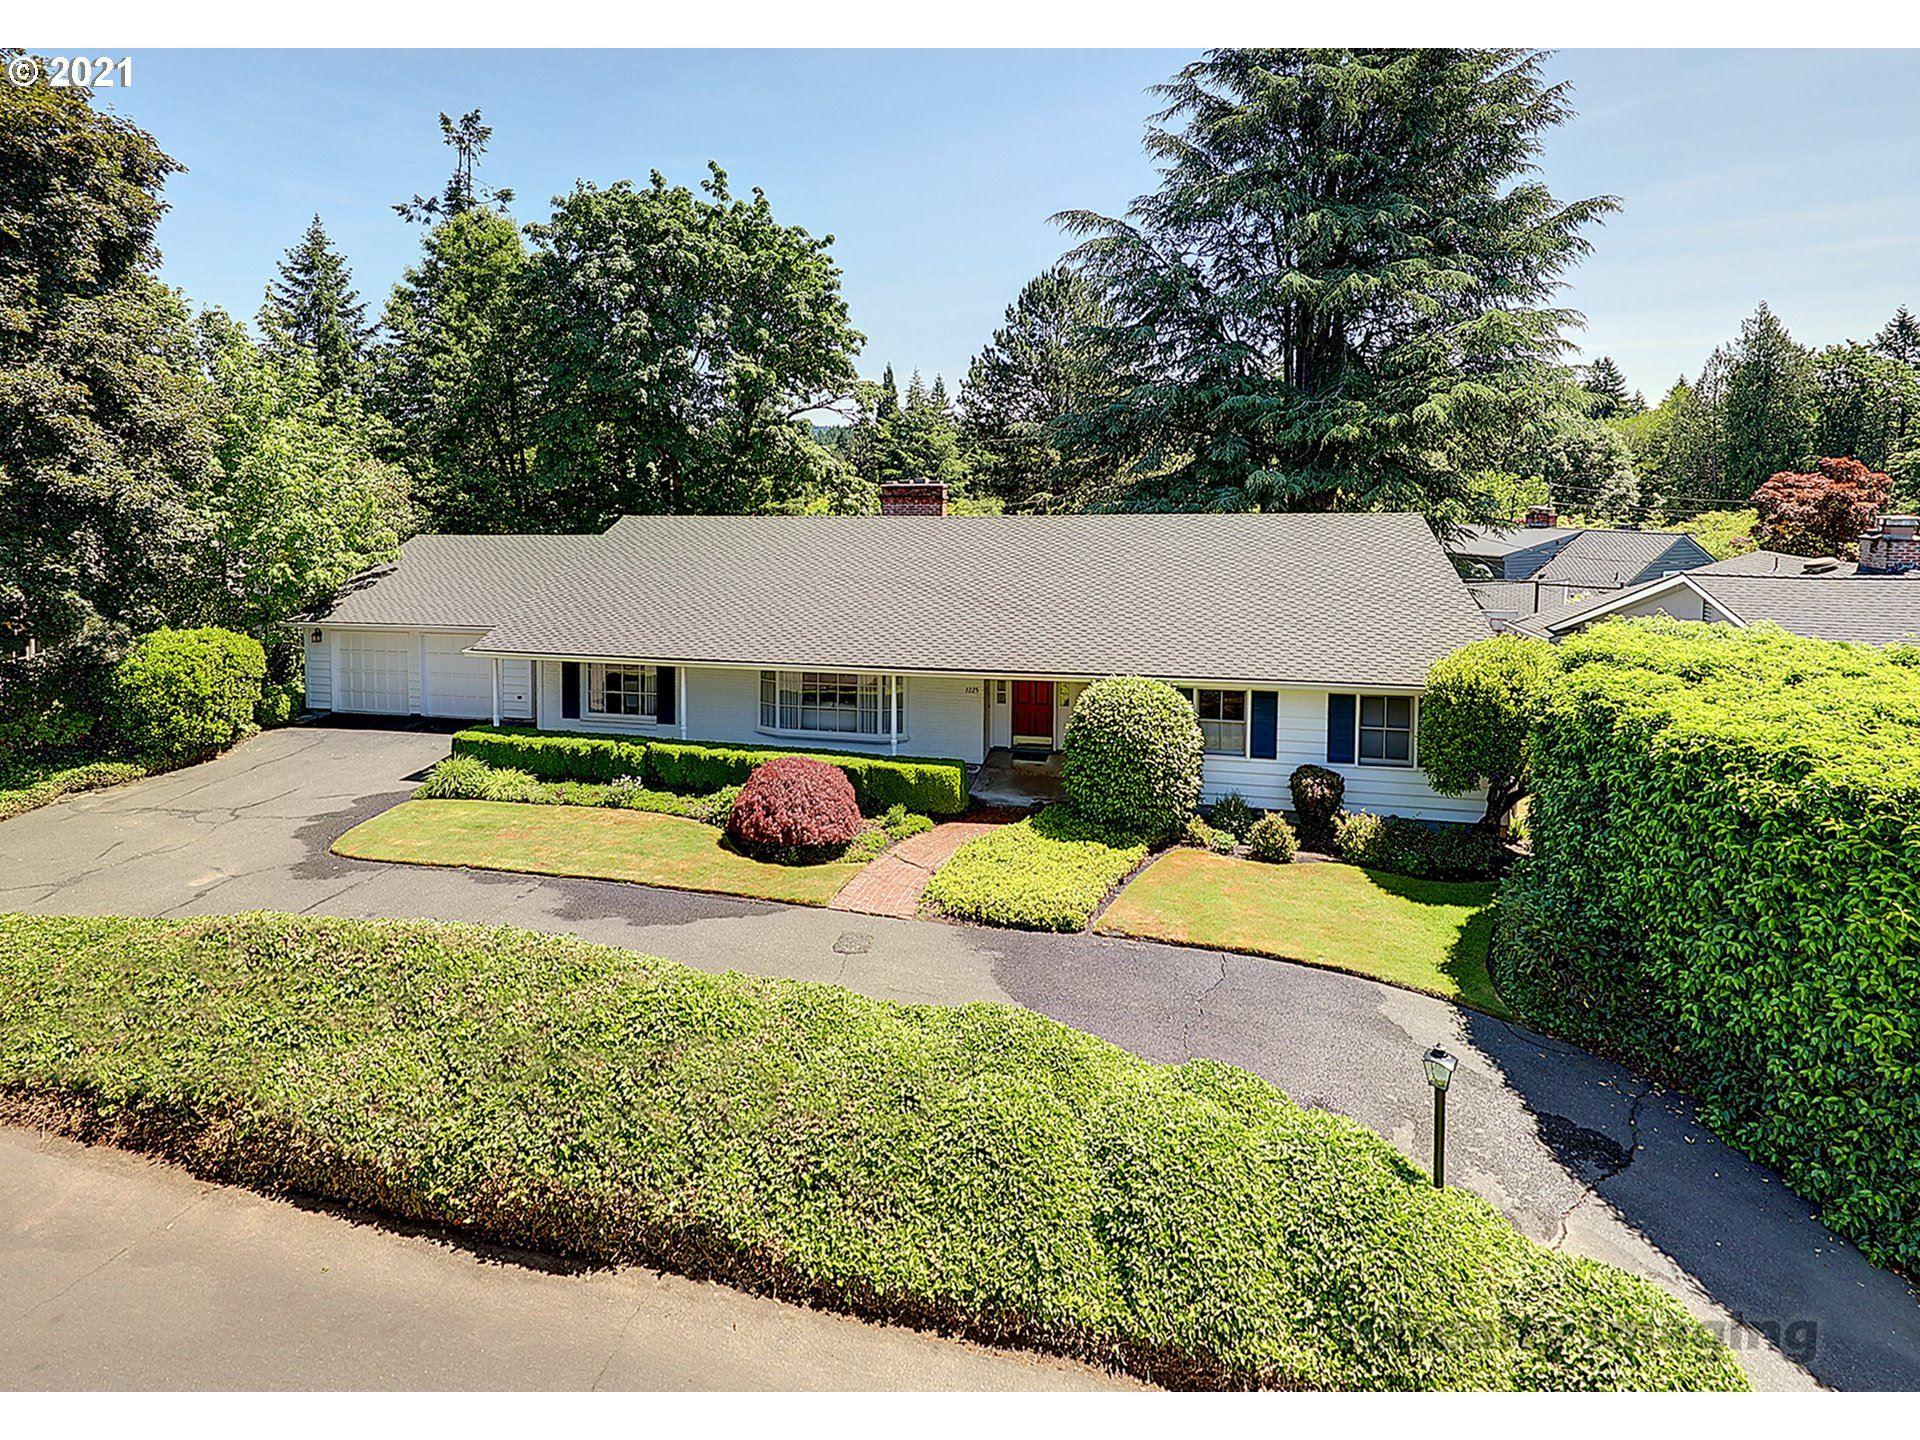 7225 SW NORTHVALE WAY, Portland, OR 97225 - MLS#: 21248457